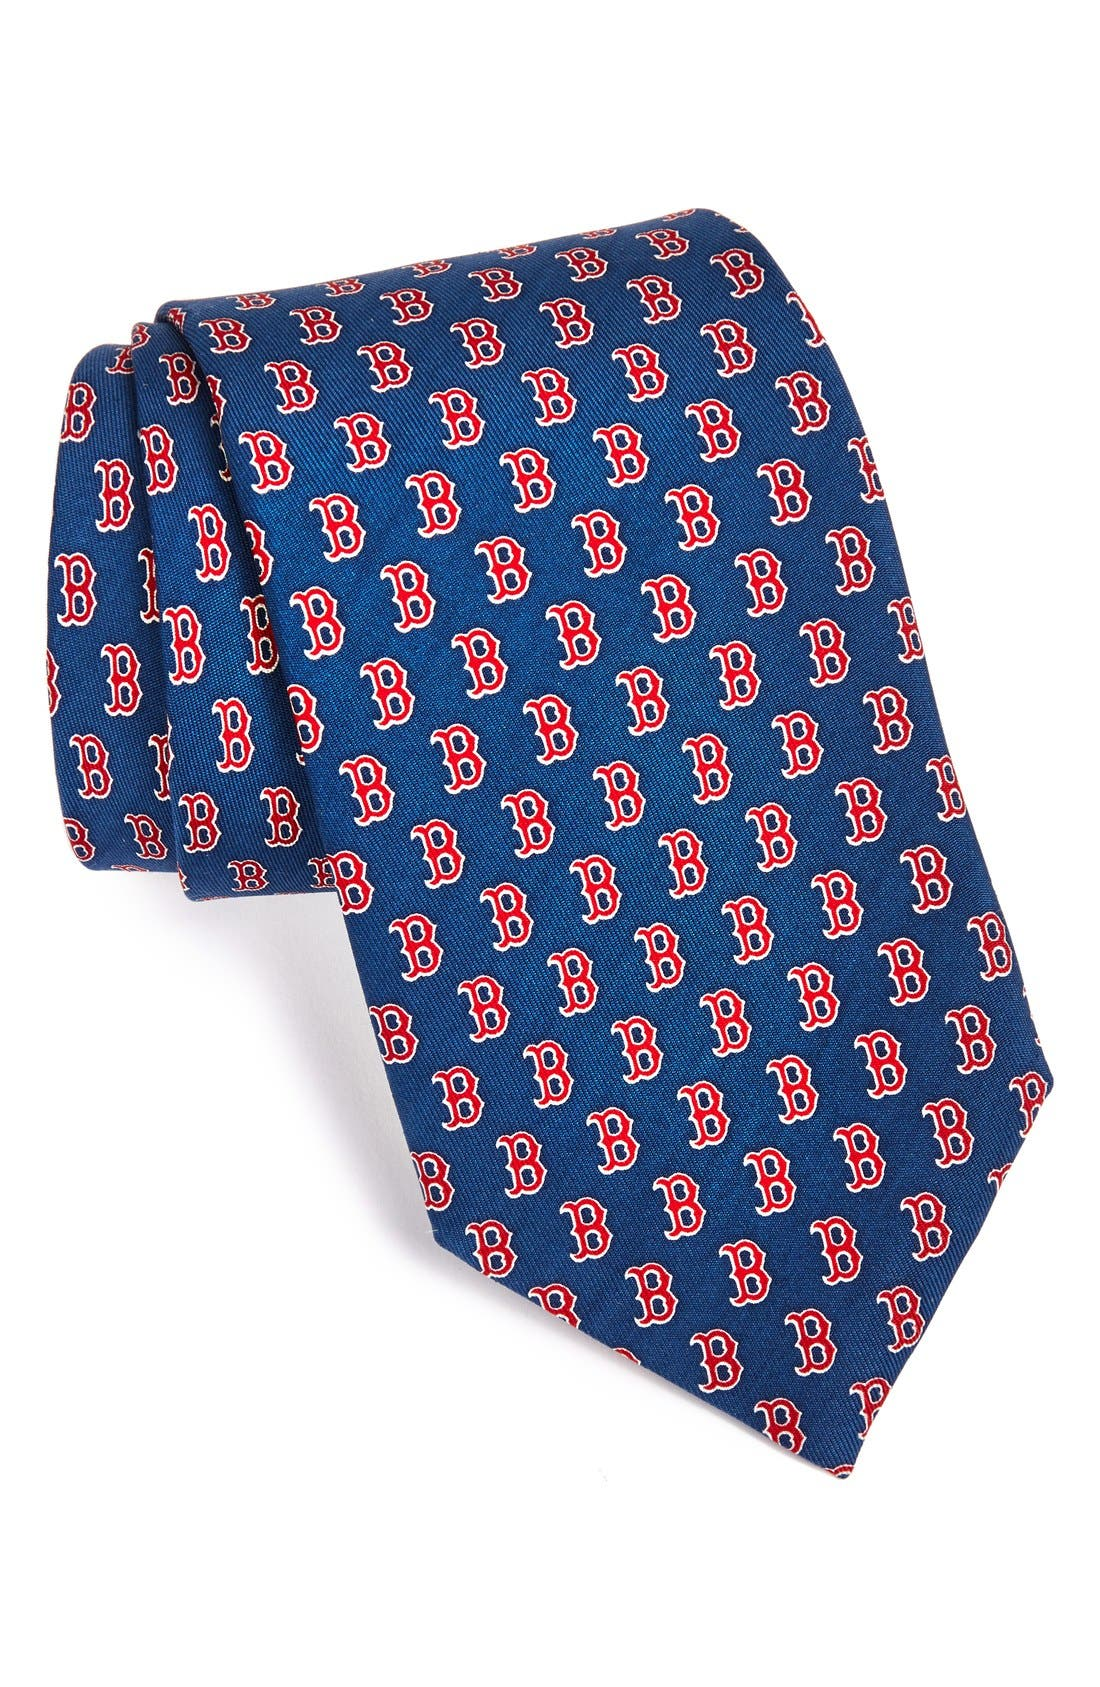 VINEYARD VINES Boston Red Sox Silk Tie, Main, color, 414